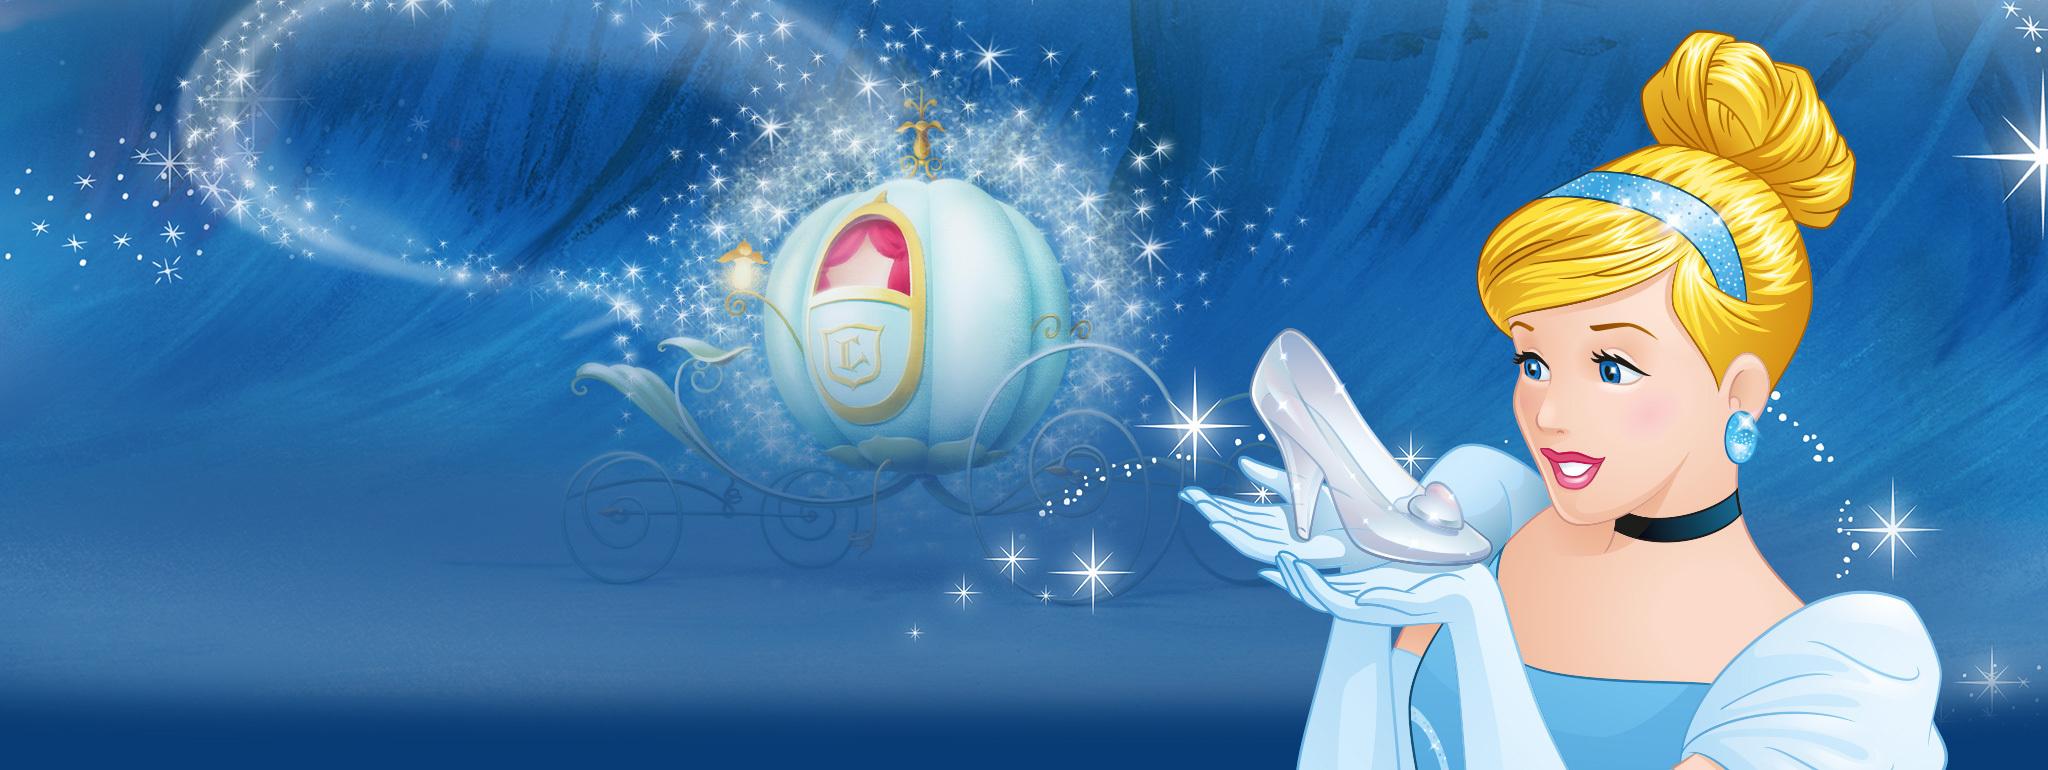 cinderella official disney princess site disney uk